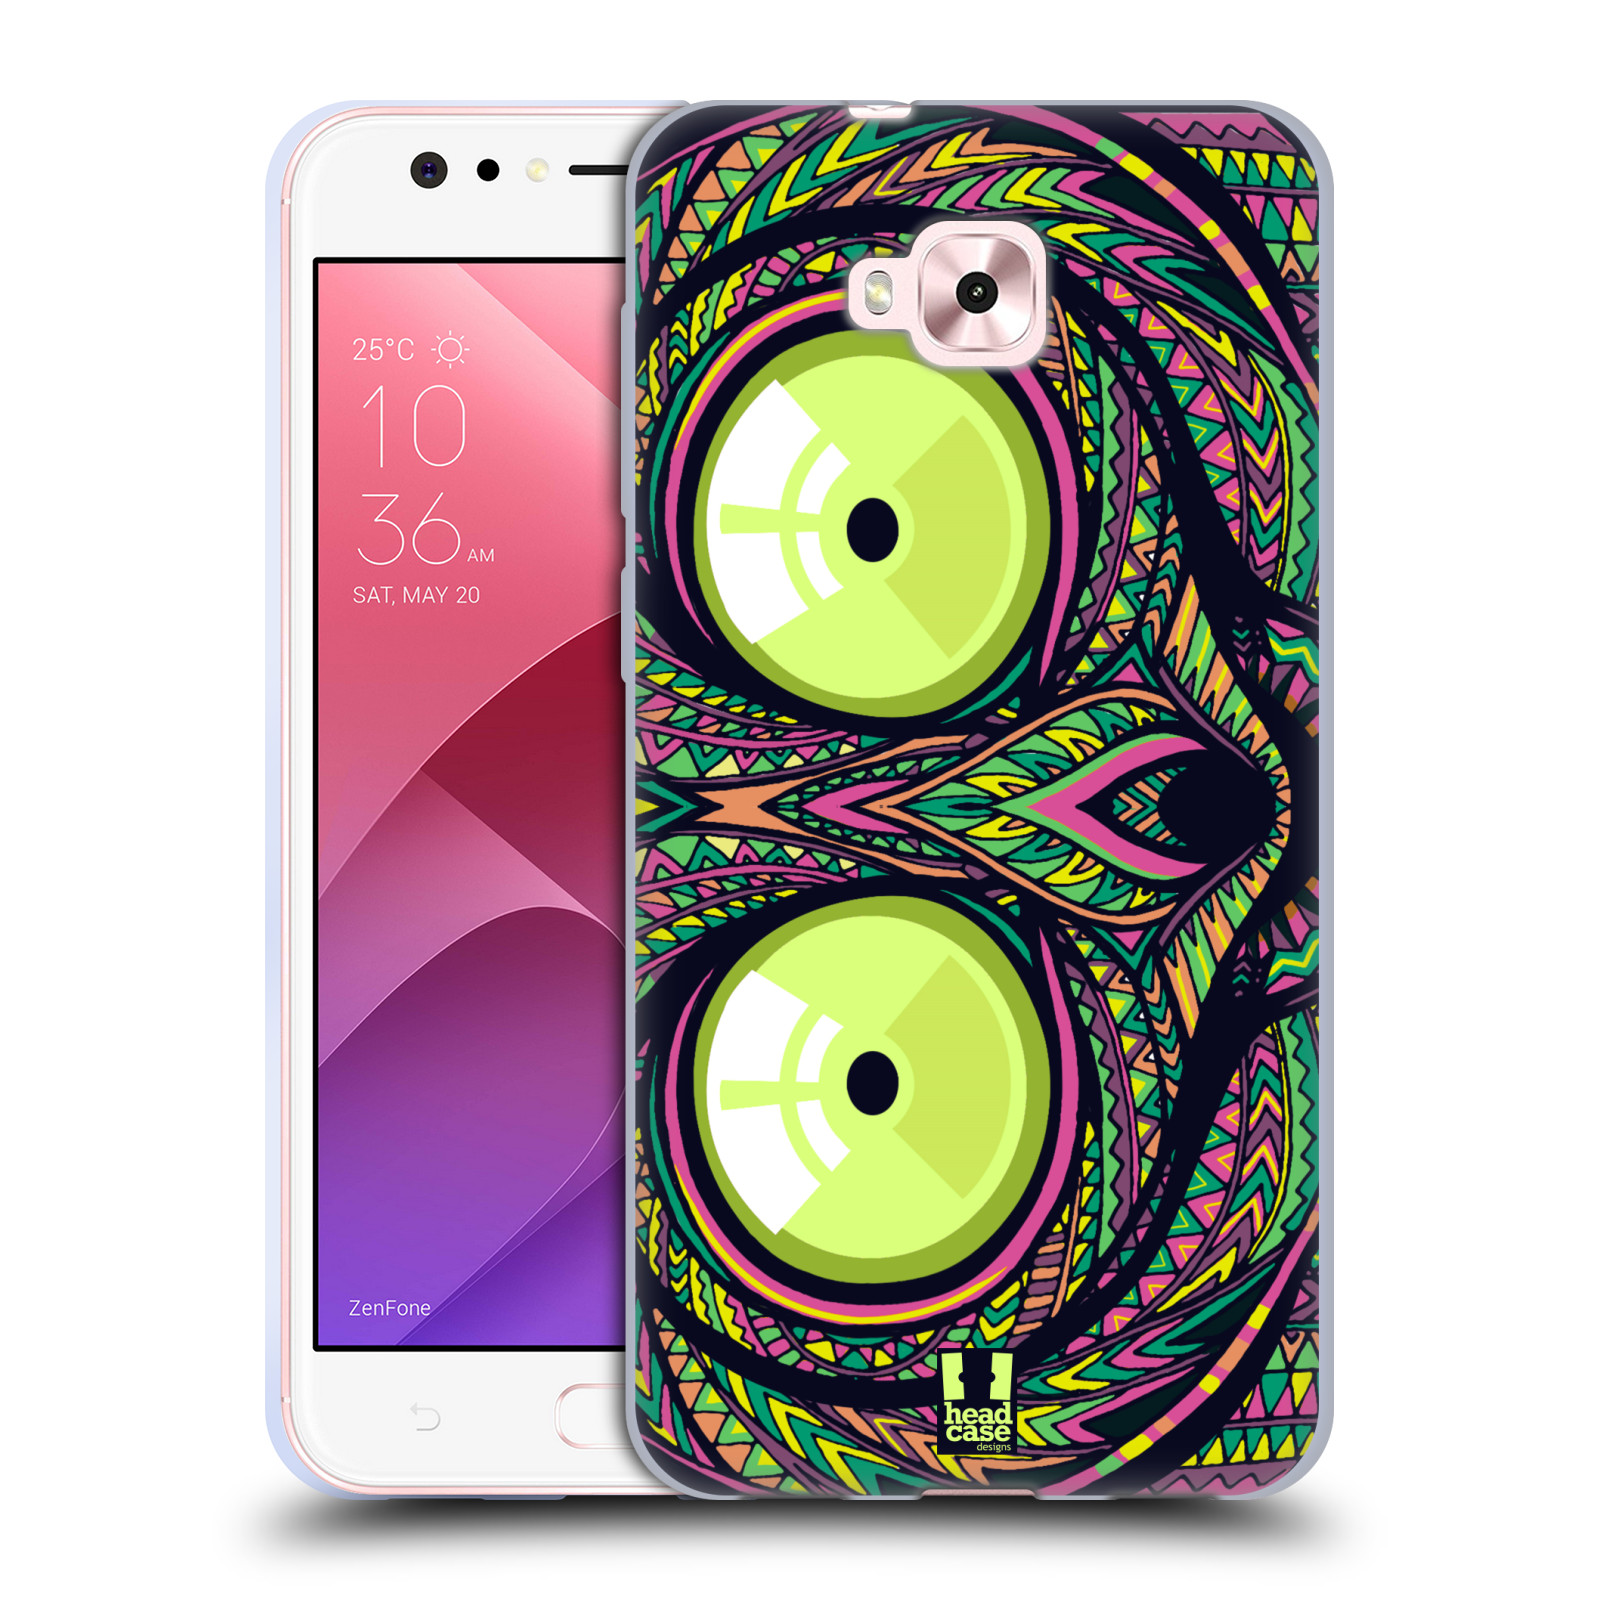 Silikonové pouzdro na mobil Asus Zenfone 4 Selfie ZD553KL - Head Case - AZTEC NÁRTOUN